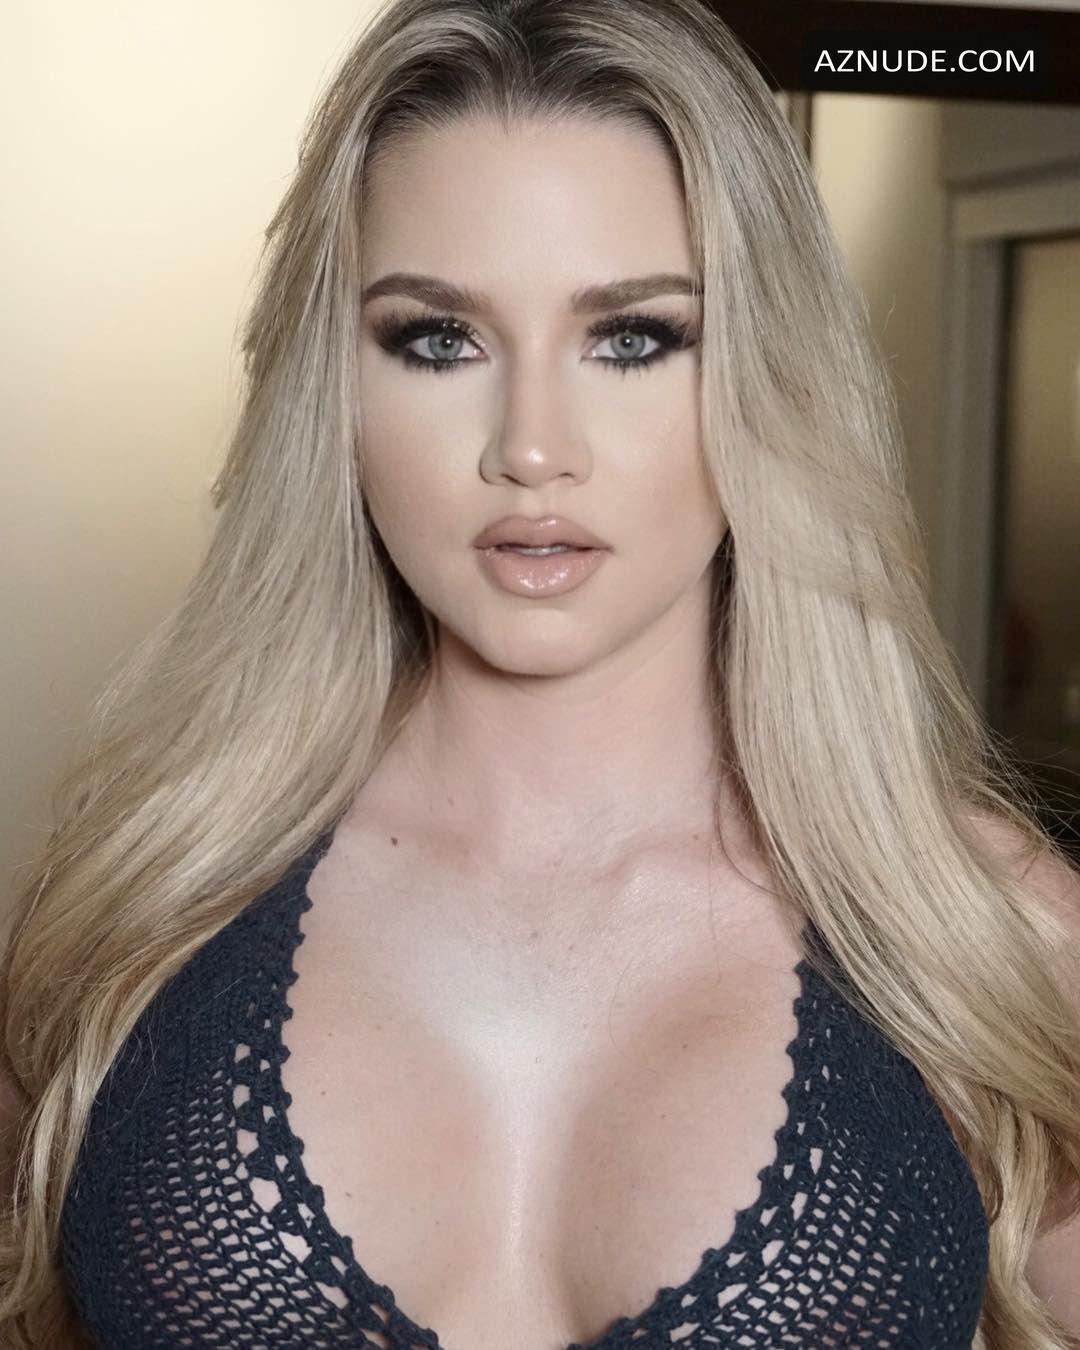 Allie Mason Nude allie mason slightly nude and sexy photos from instagram